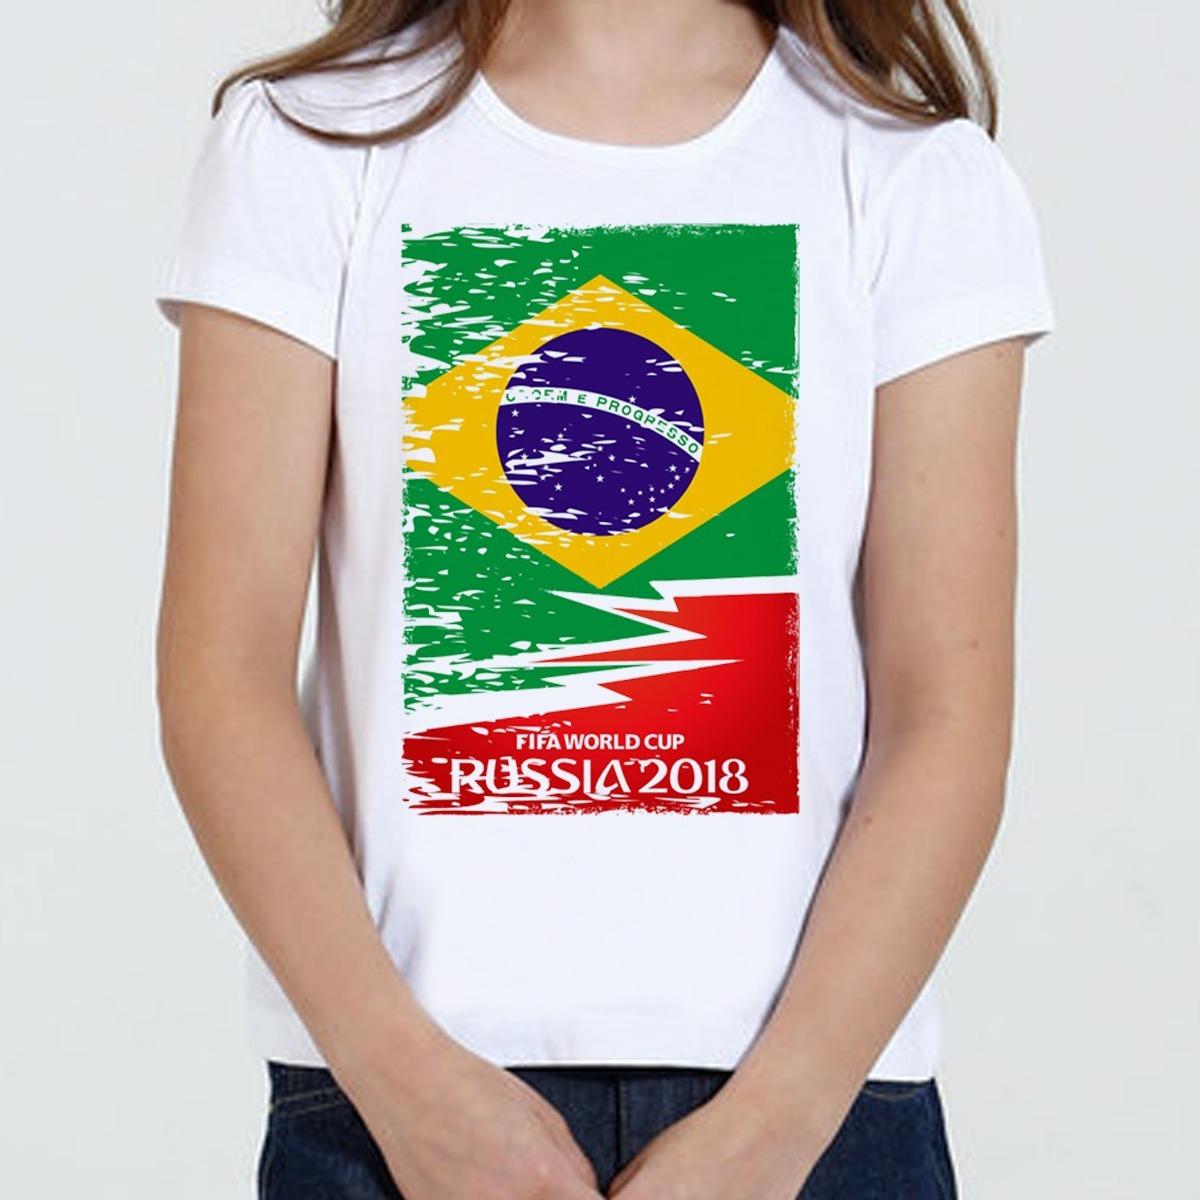 0e1a6b1a7eaa2 Camiseta Camisa Copa Do Mundo Russia Brasil - R  29